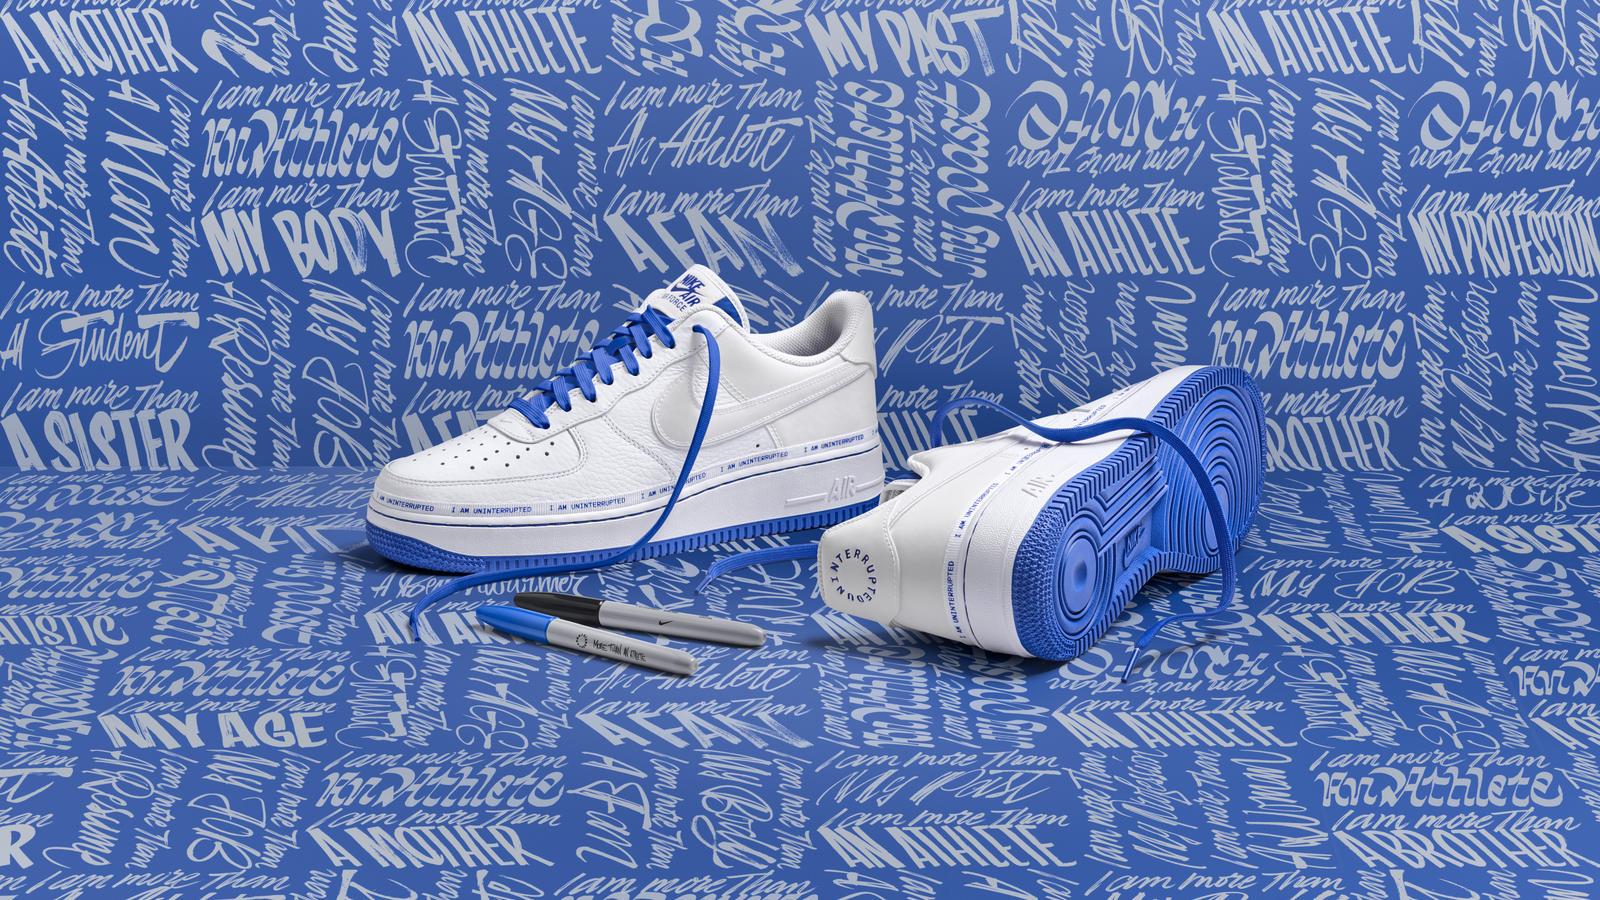 Nike air force 1 see through white yellow   Nike shoes air